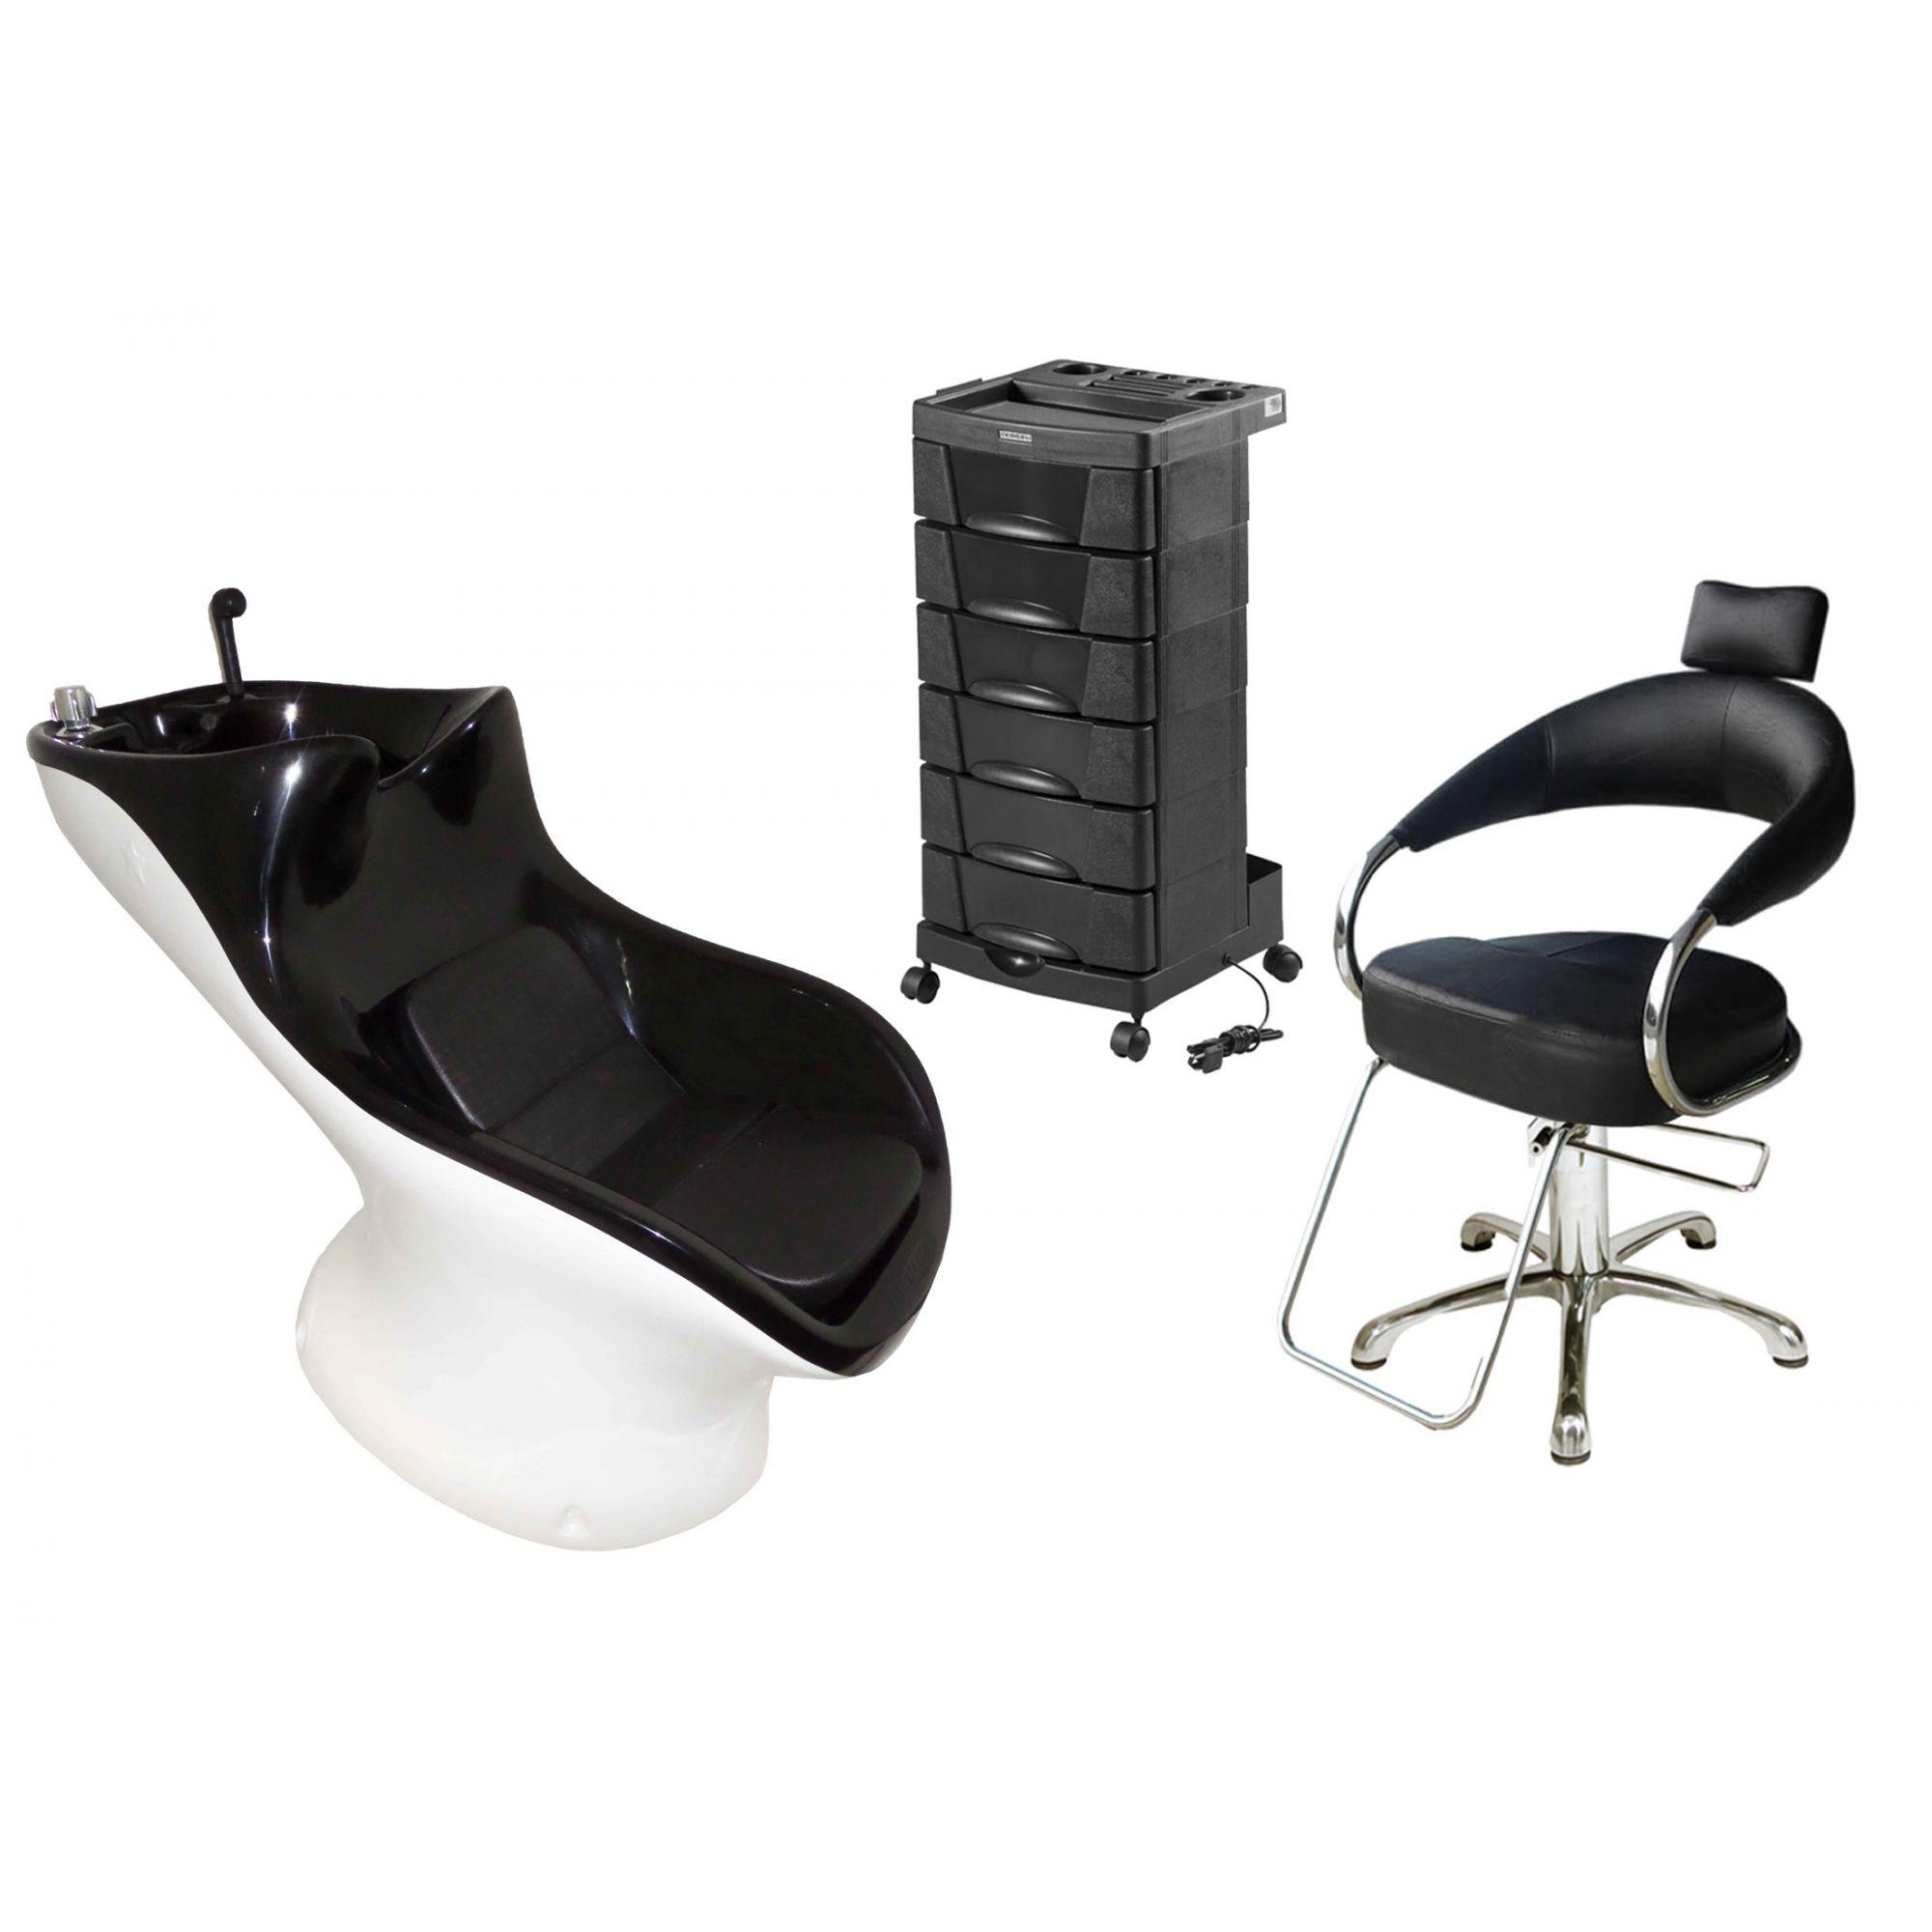 Lavatório Star Italiano + Cadeira Hidráulica Futurama + Beauty